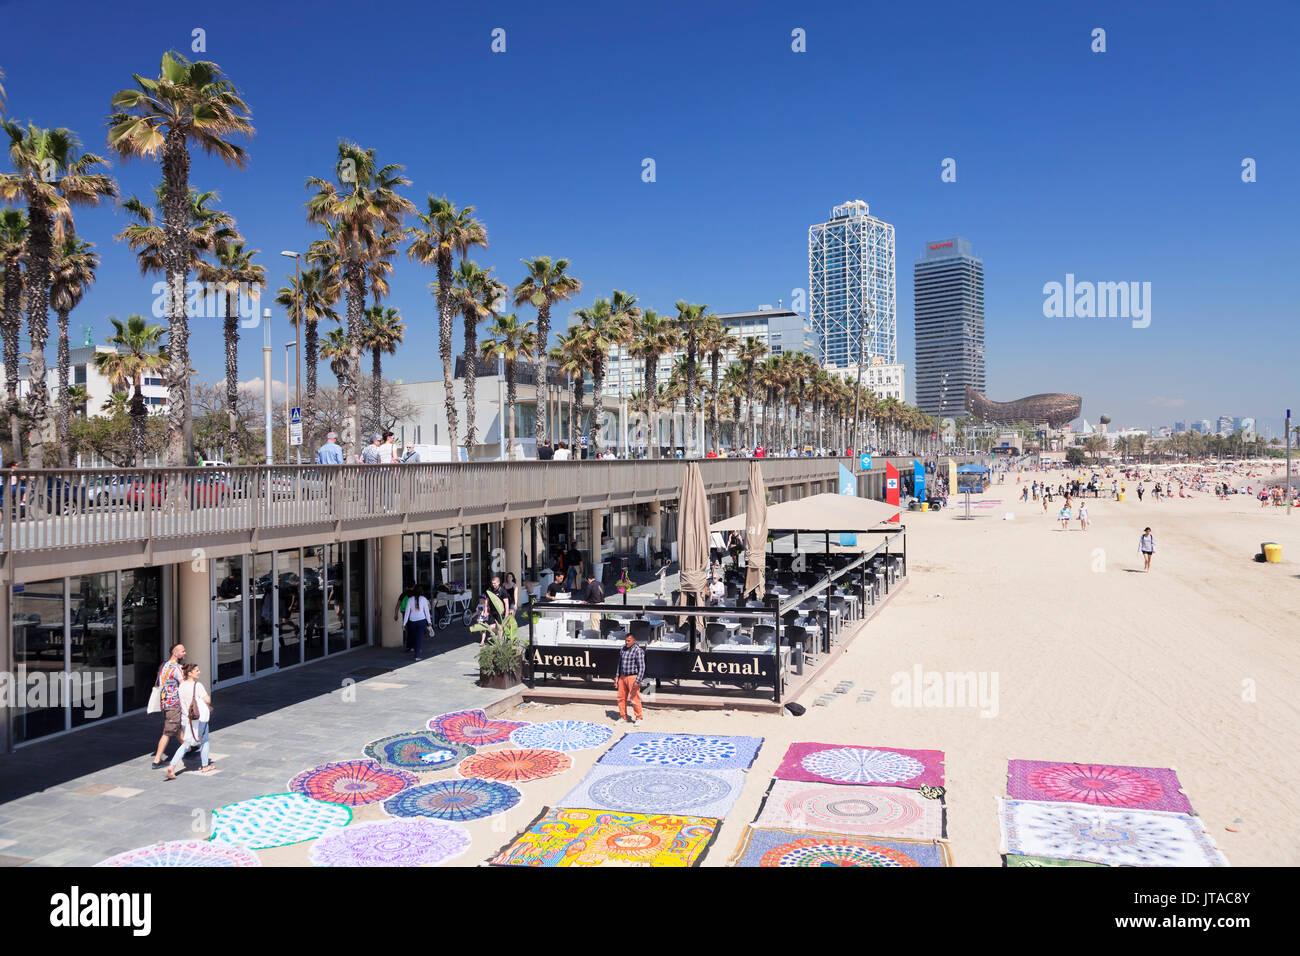 Barceloneta Beach, Port Olimpic, Mapfre Turm, Turm, Peix, Fisch Skulptur von Frank Owen Gehry, Barcelona, Katalonien, Spanien Stockbild